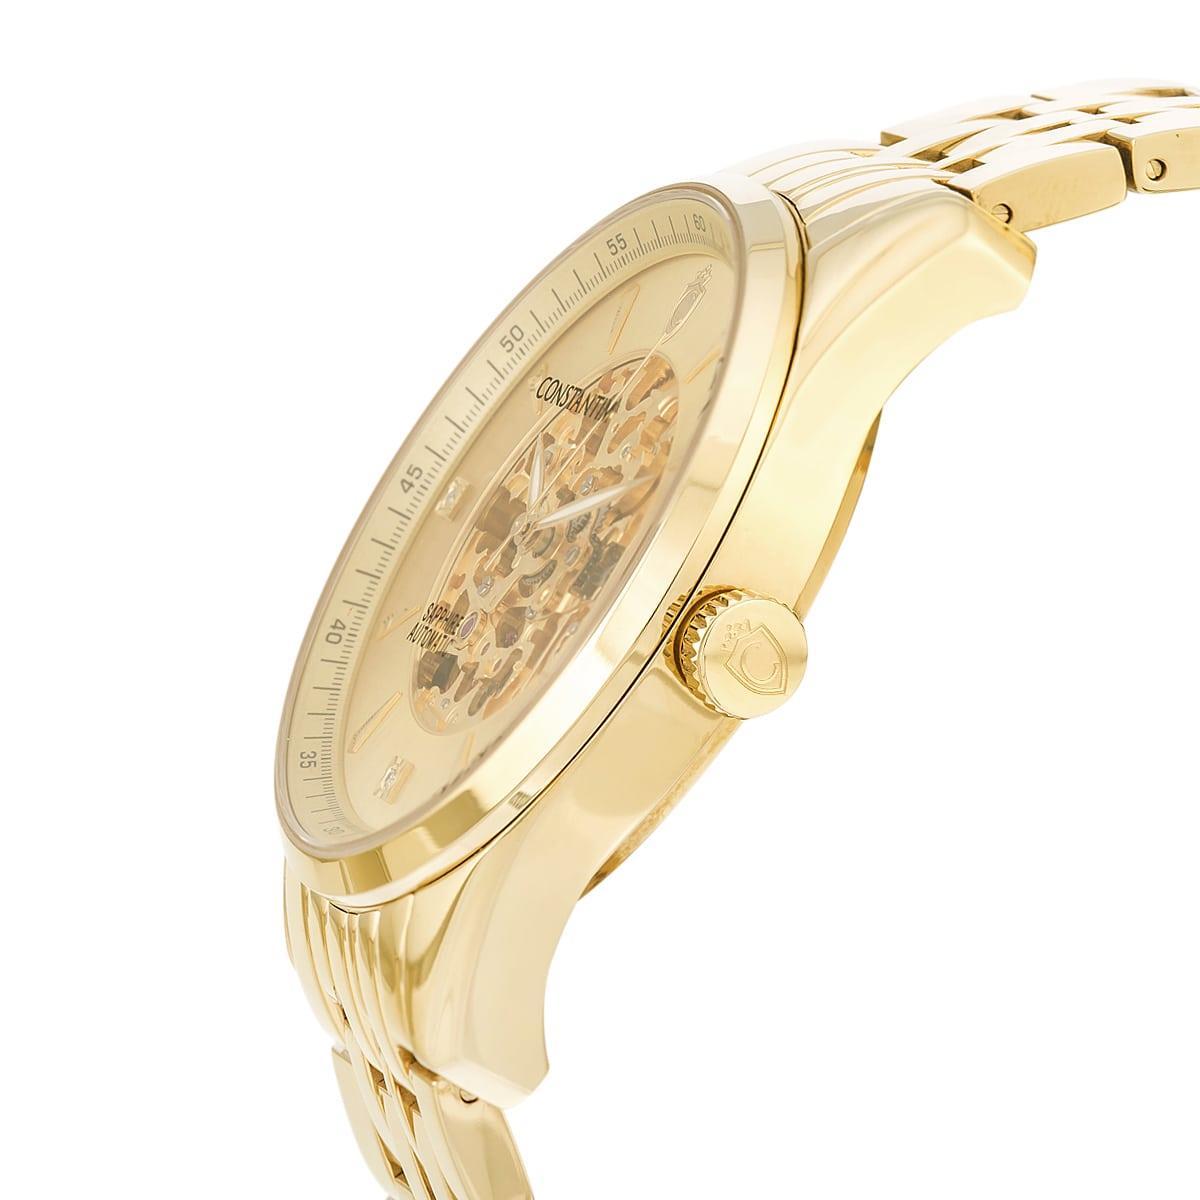 68a1e49fbdd Relógio Constantim Automatic ZW20118G Gents Gold